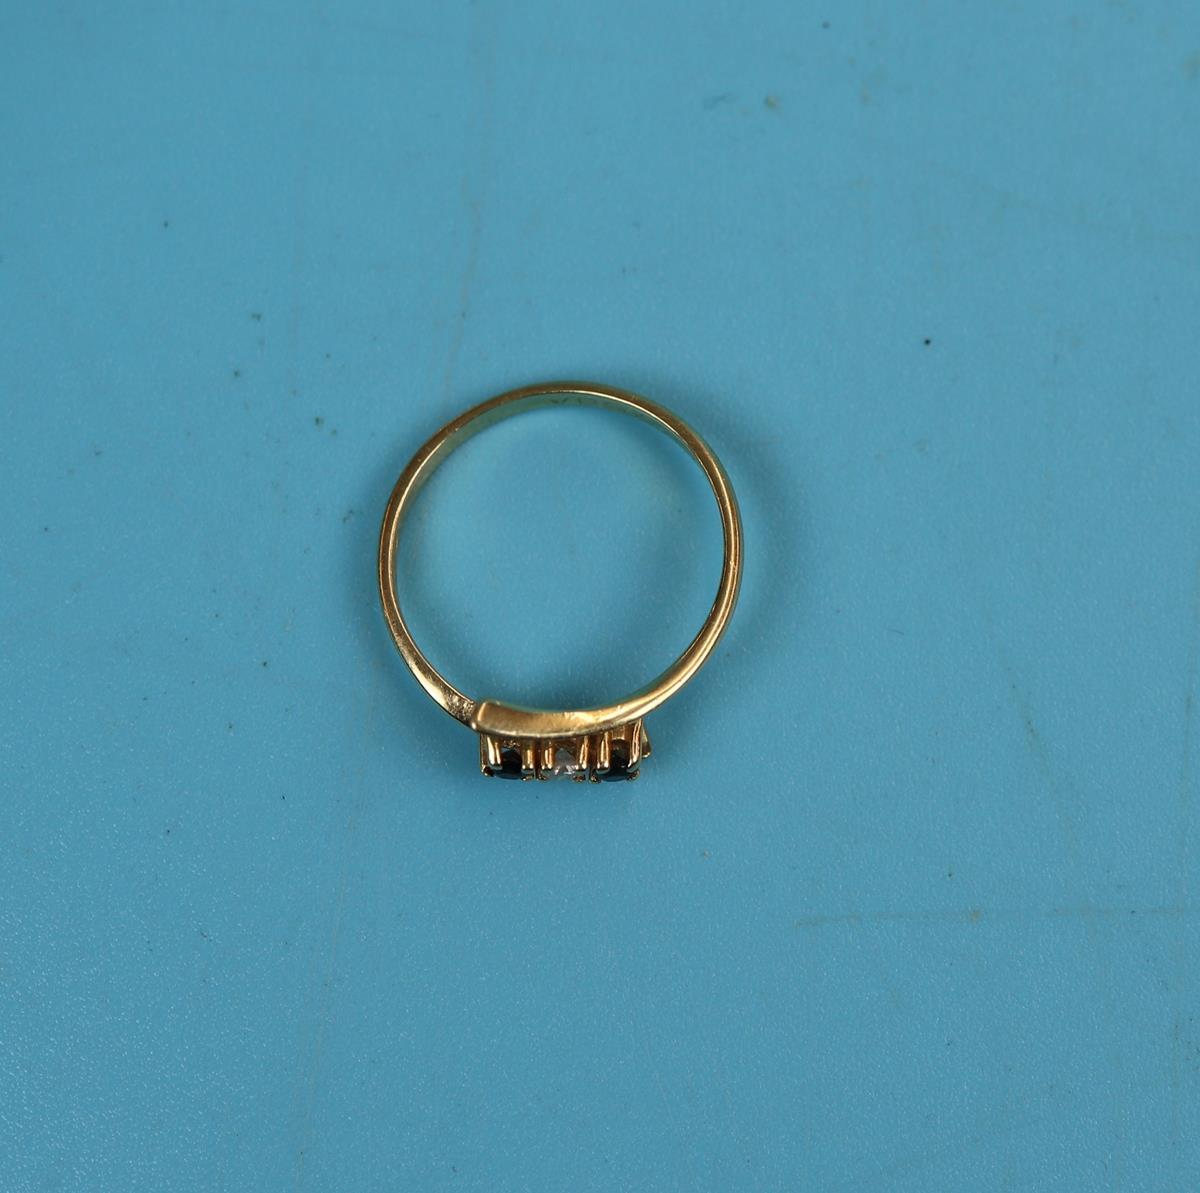 18ct gold 3 stone sapphire & diamond ring - Image 2 of 2